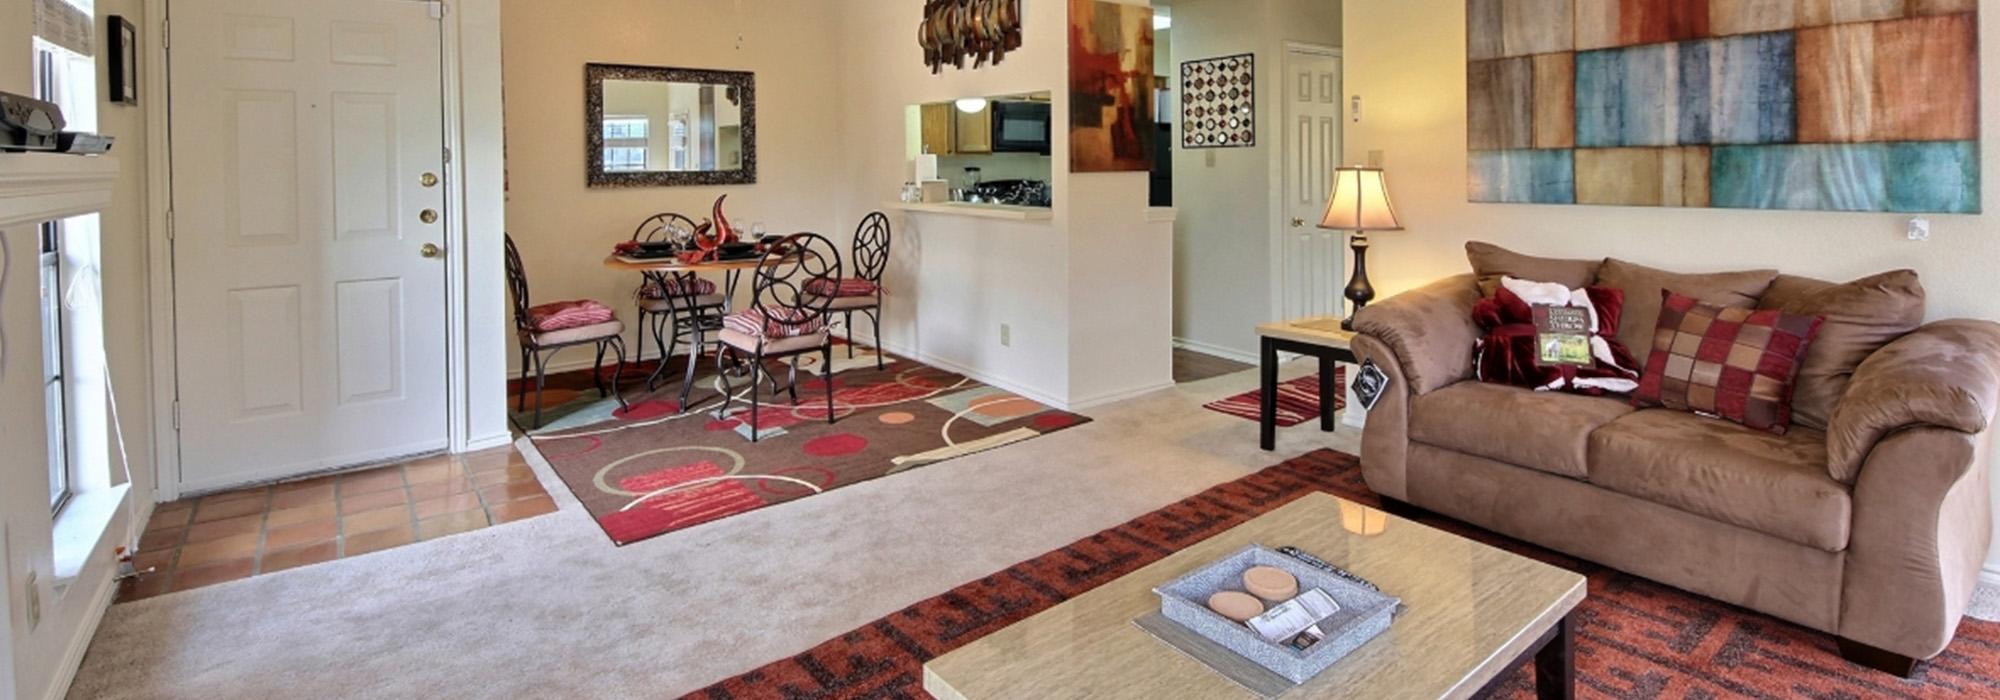 sir winston corporate housing san antonio furnished apts